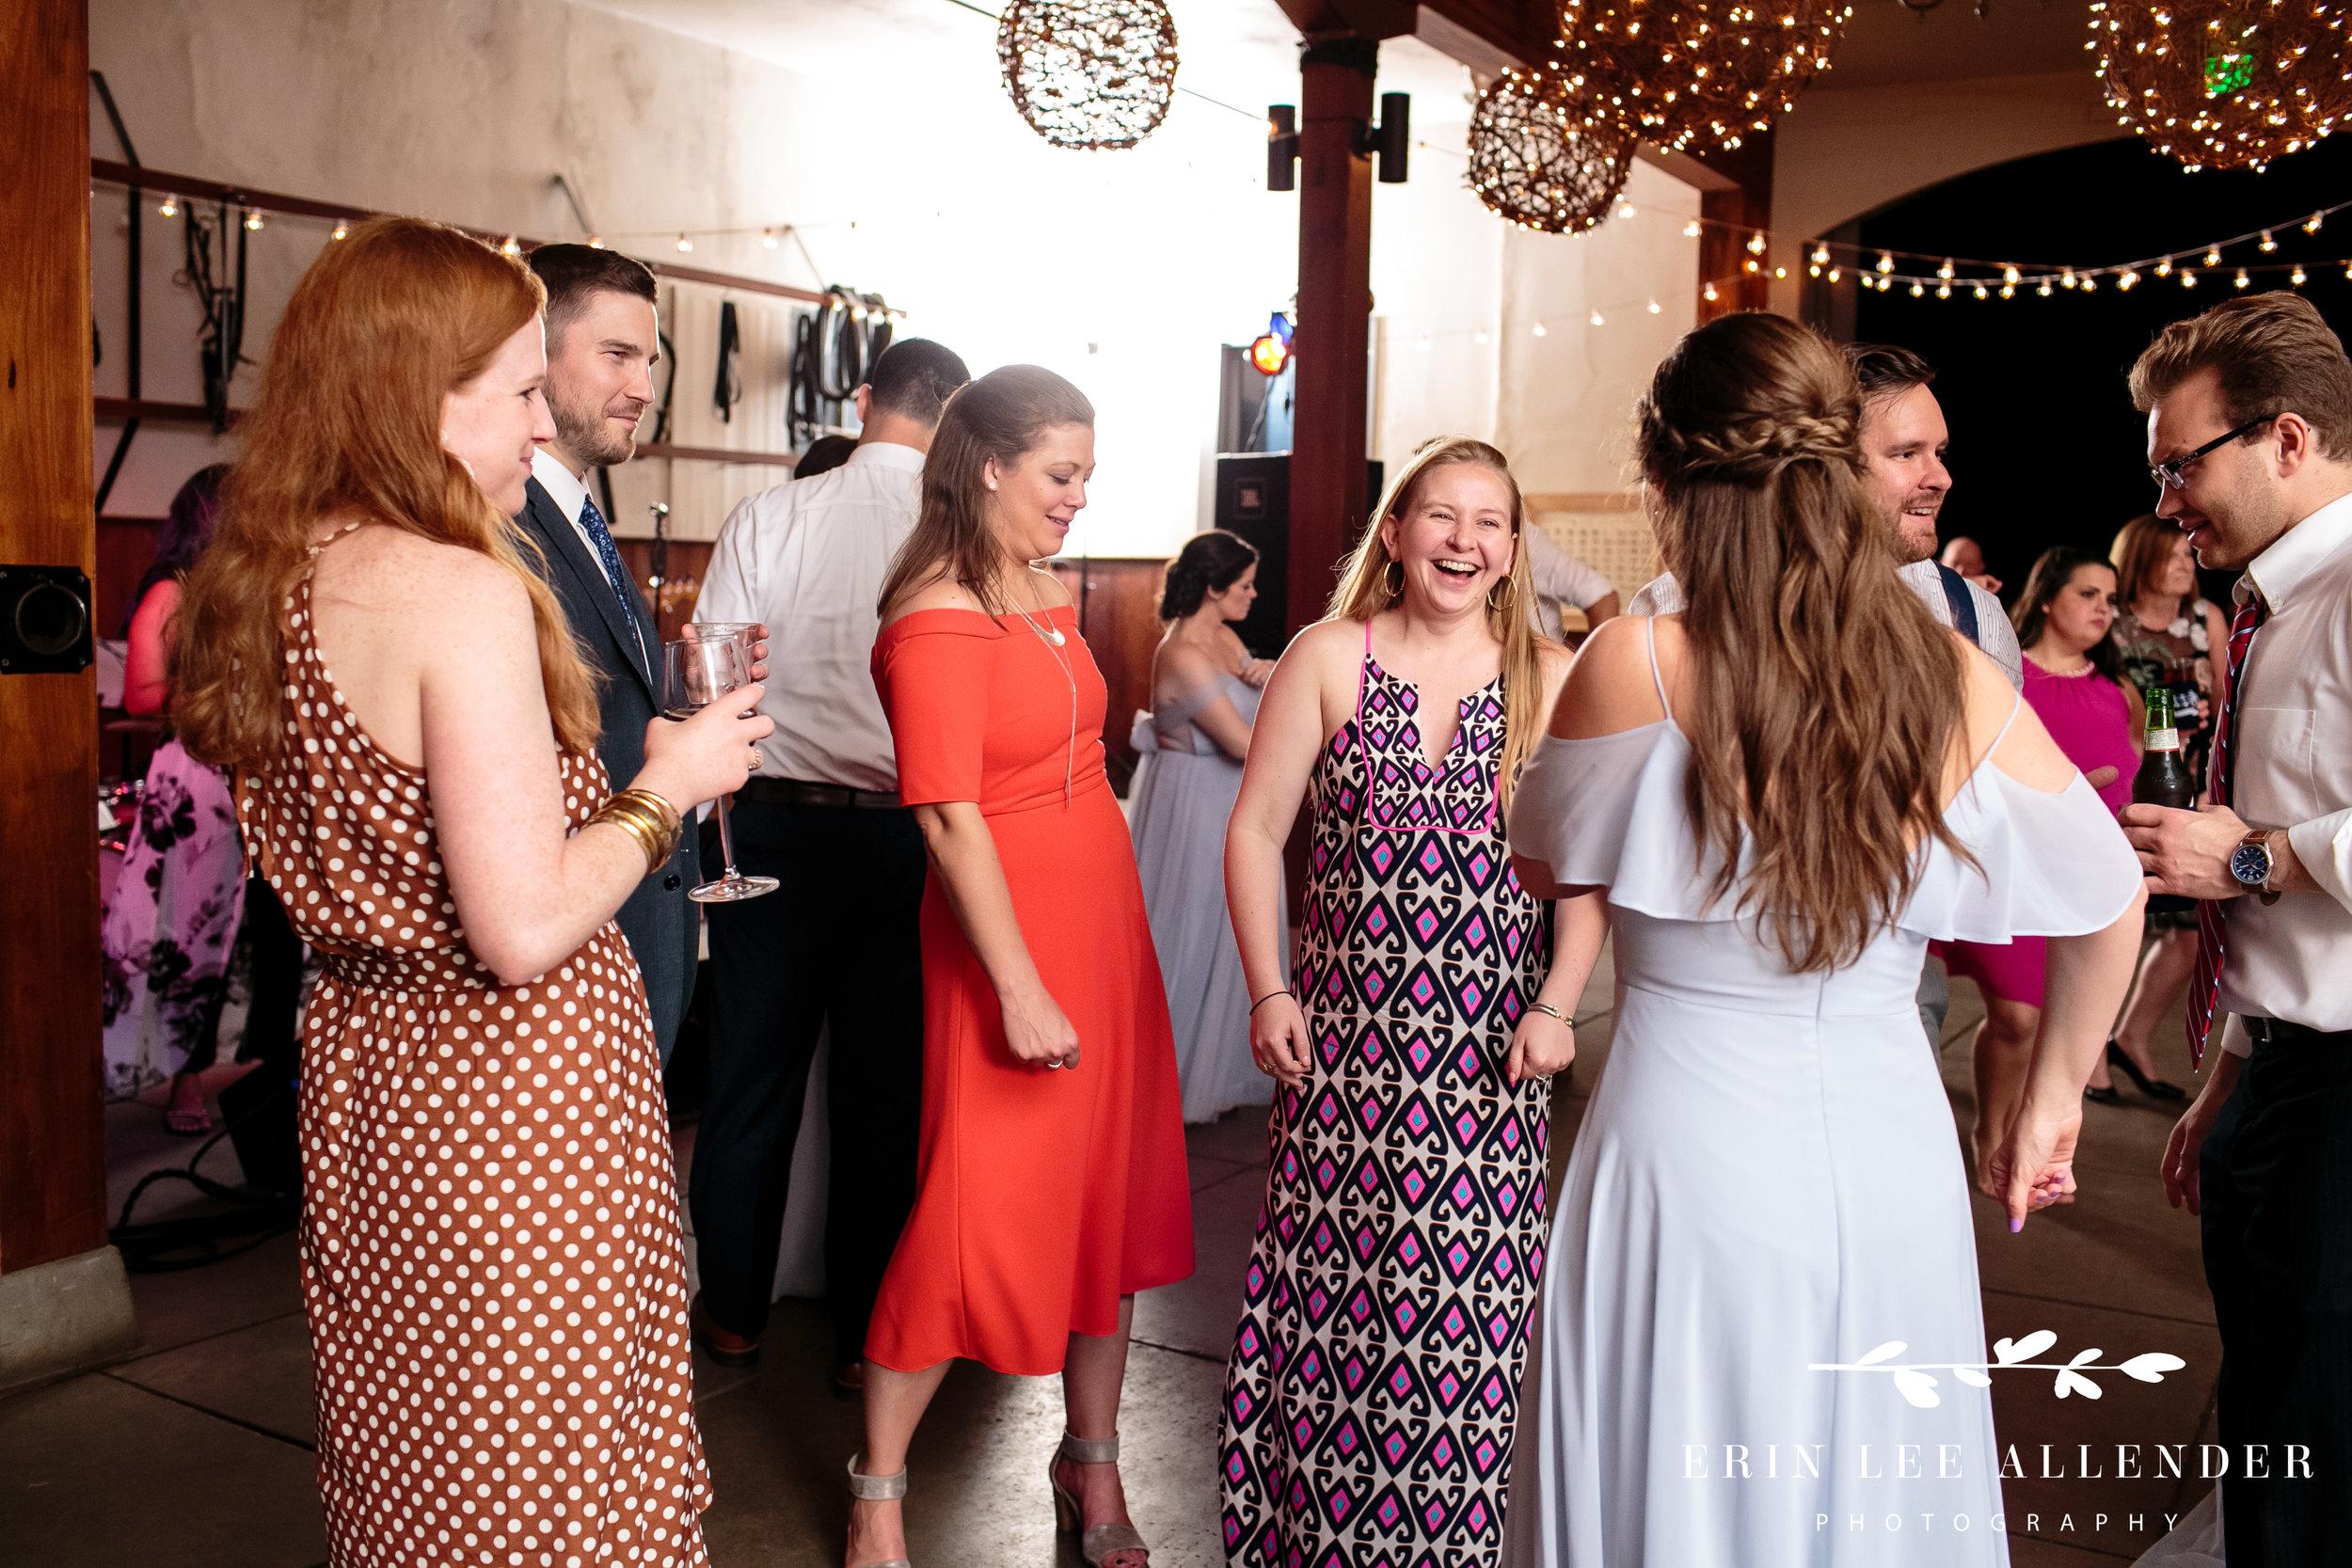 belle-meade-wedding-reception